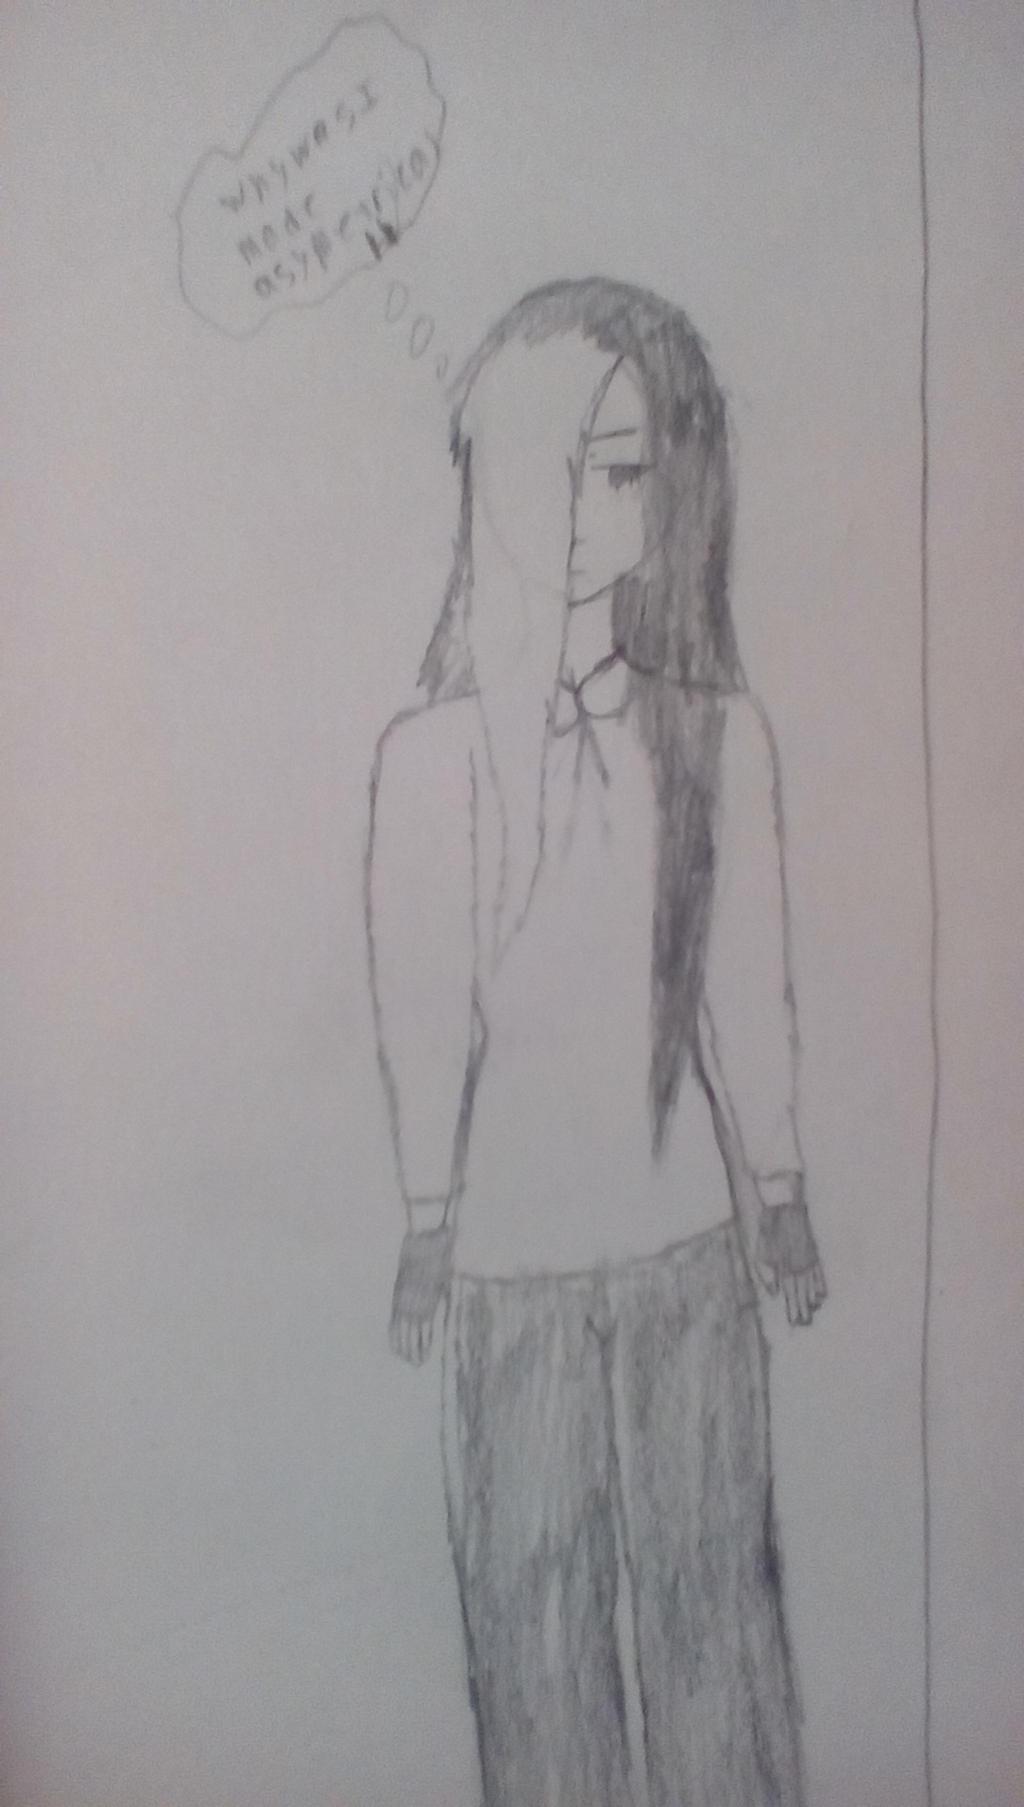 different art styles #1 by Shotgungamer8